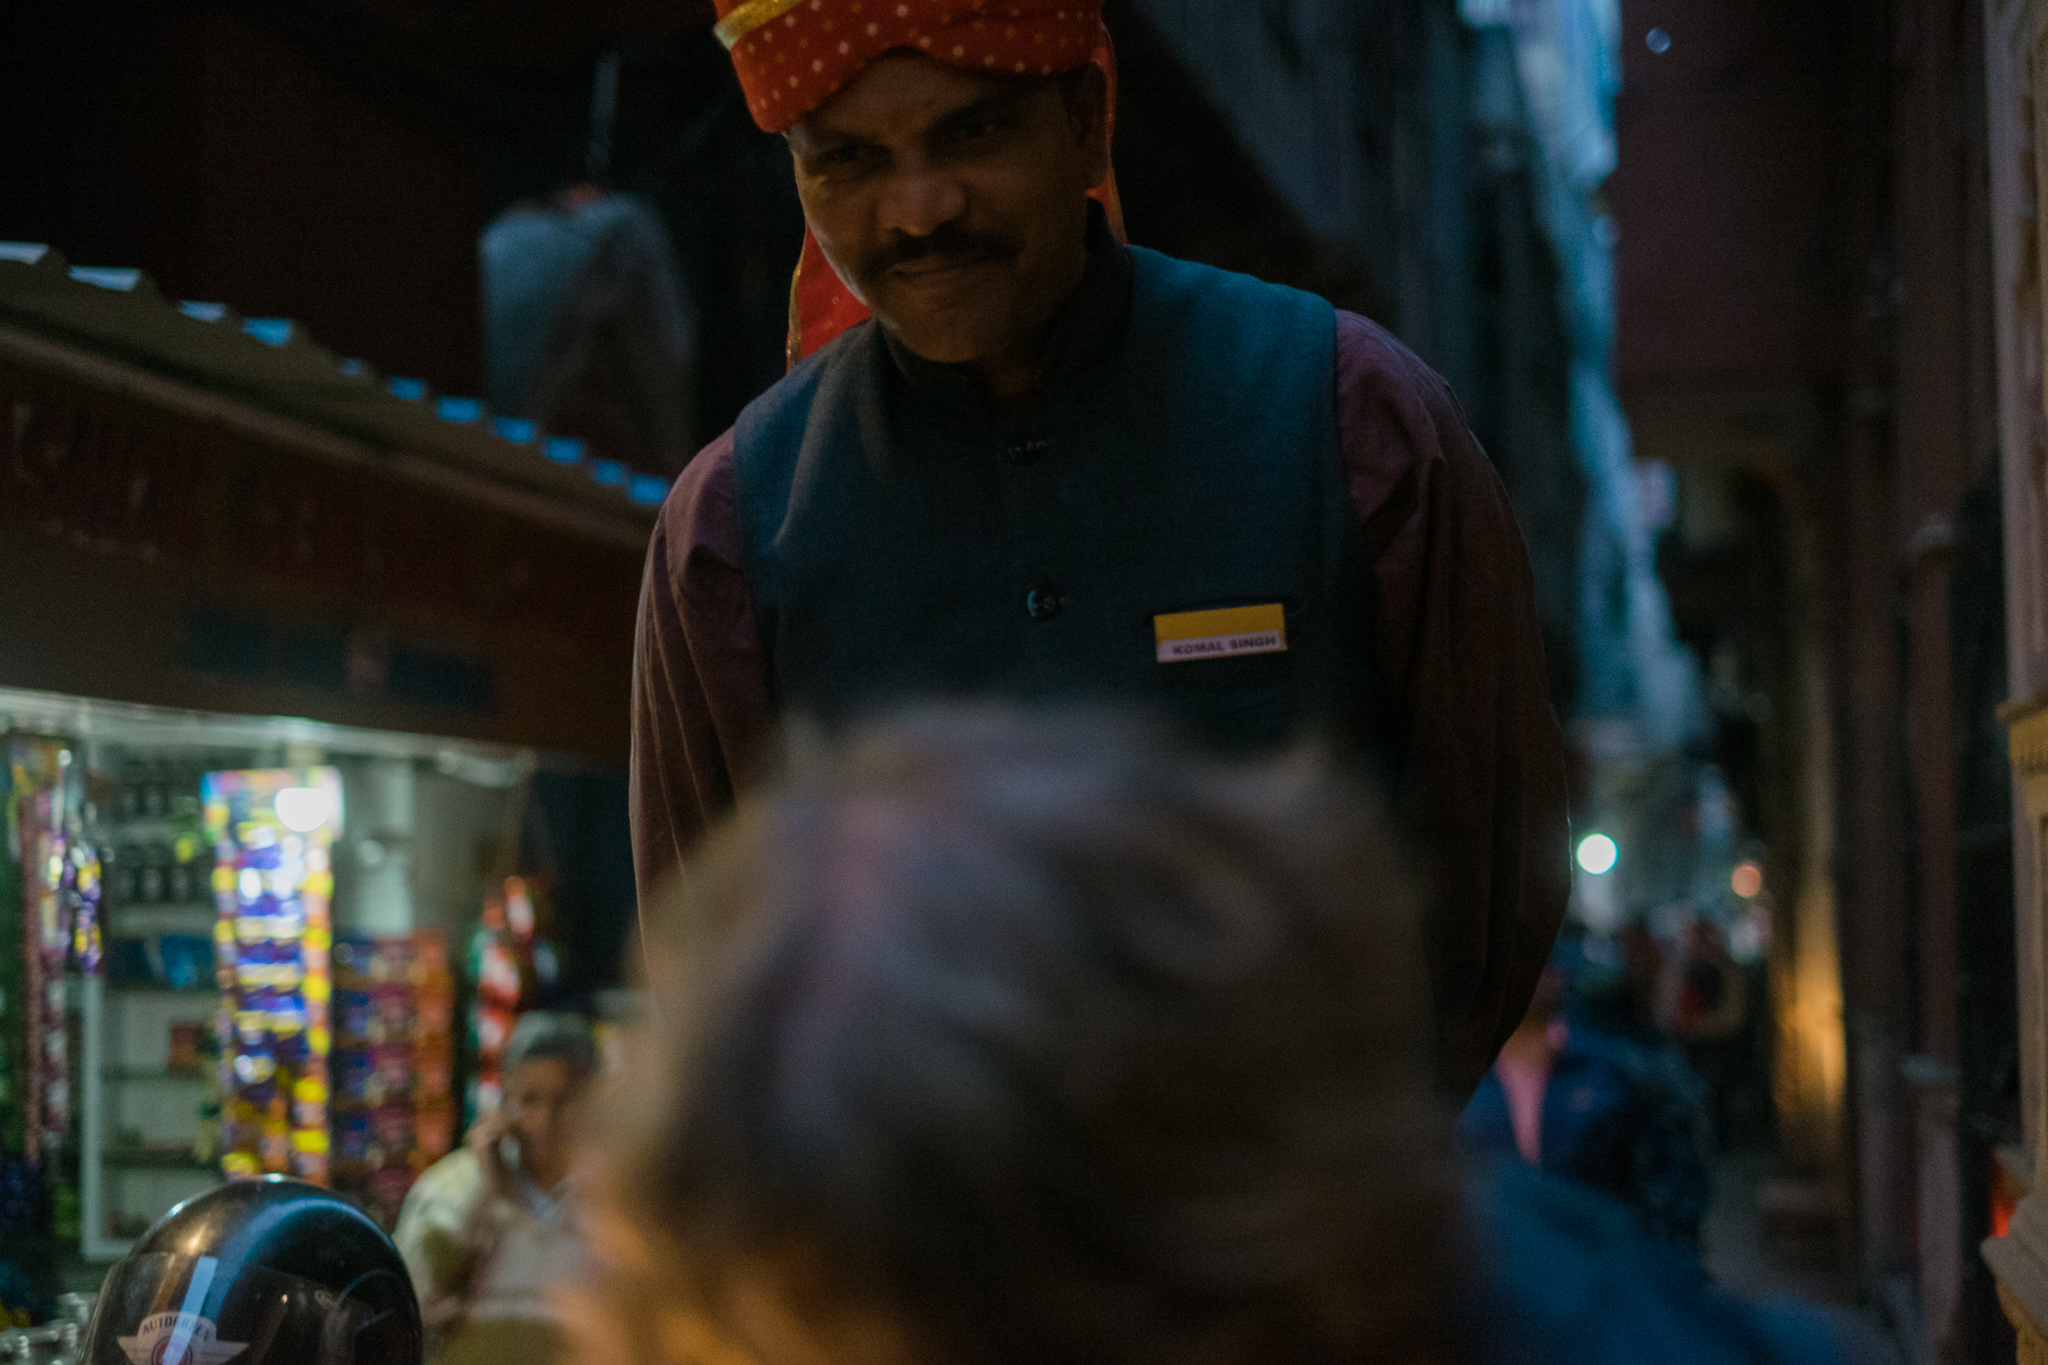 Delhi India Travel Street Photography (34 of 47).jpg